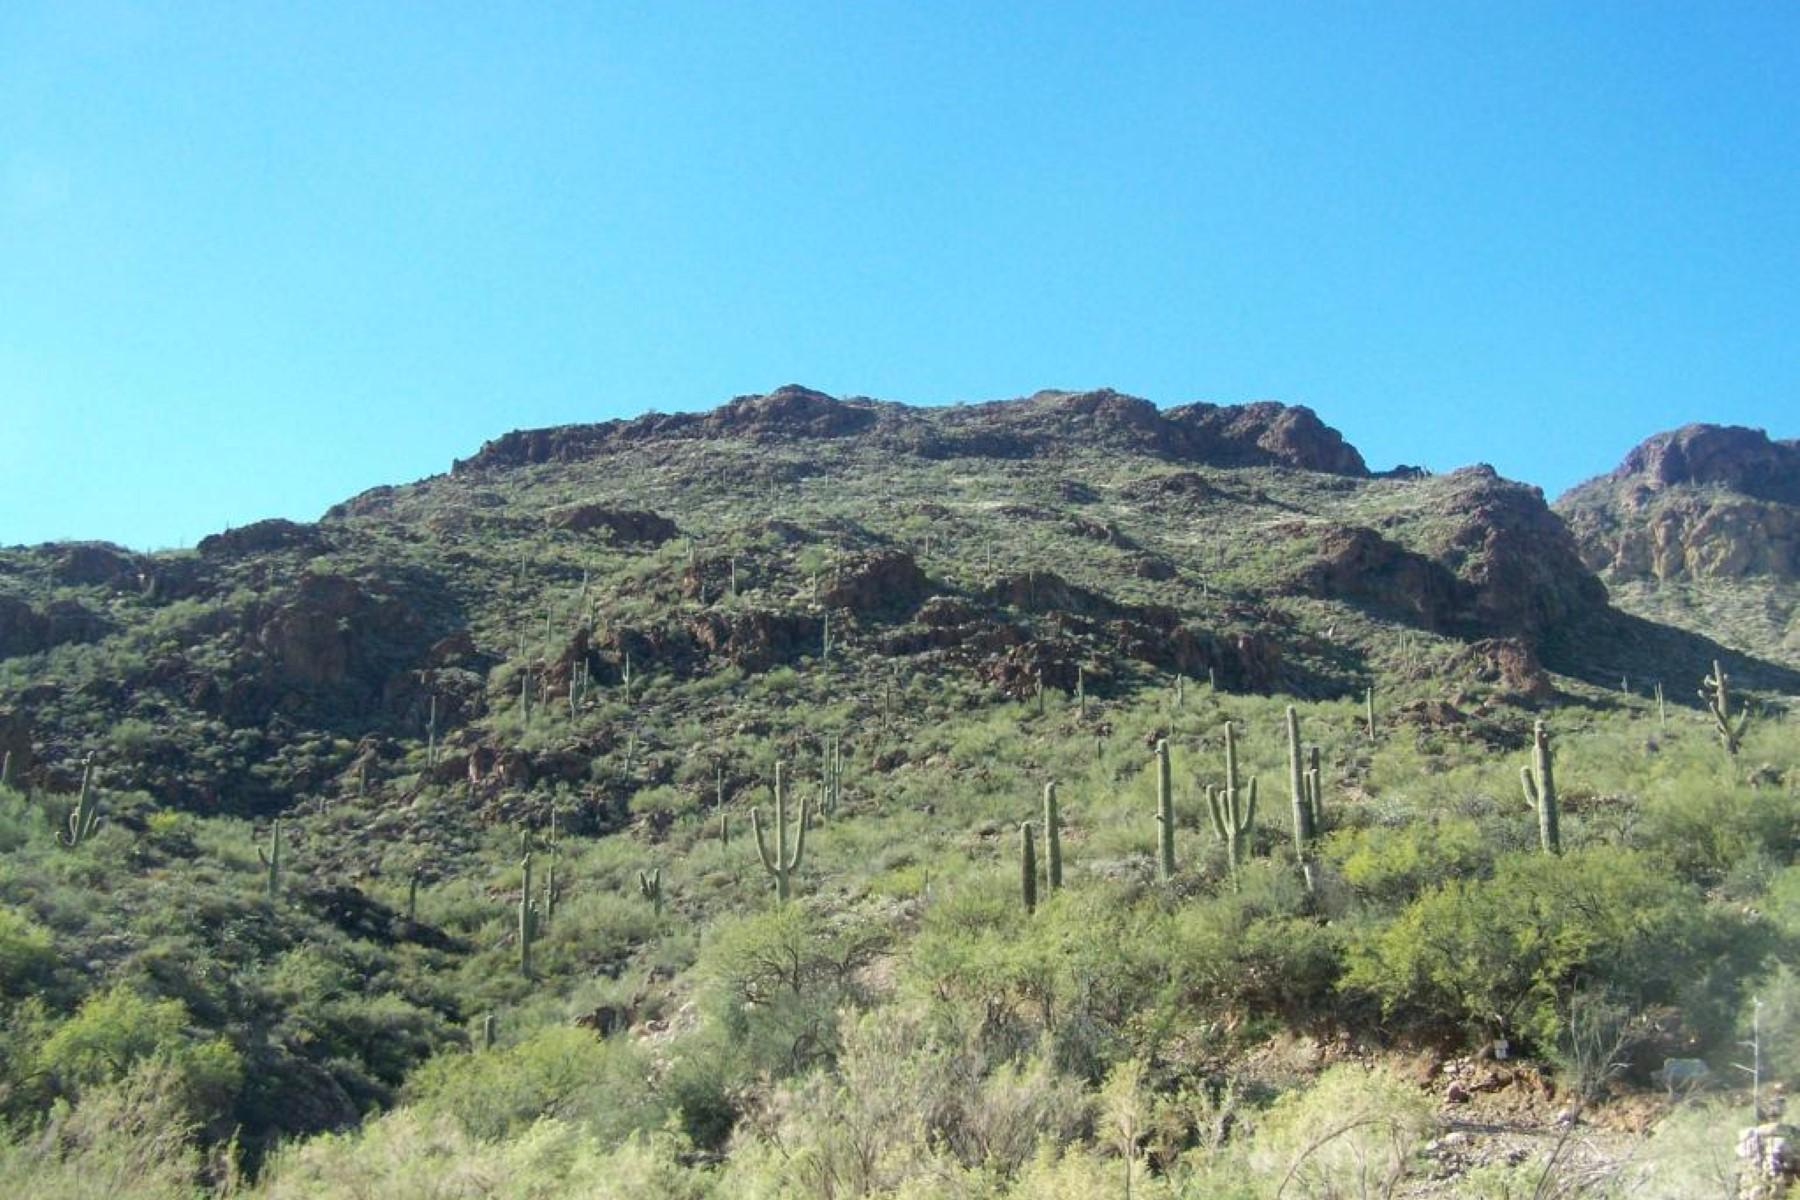 Terrain pour l Vente à Extreme mountainous property, dramatic high desert terrain and lake views 0 S Cow Creek RD S #8 Morristown, Arizona, 85342 États-Unis